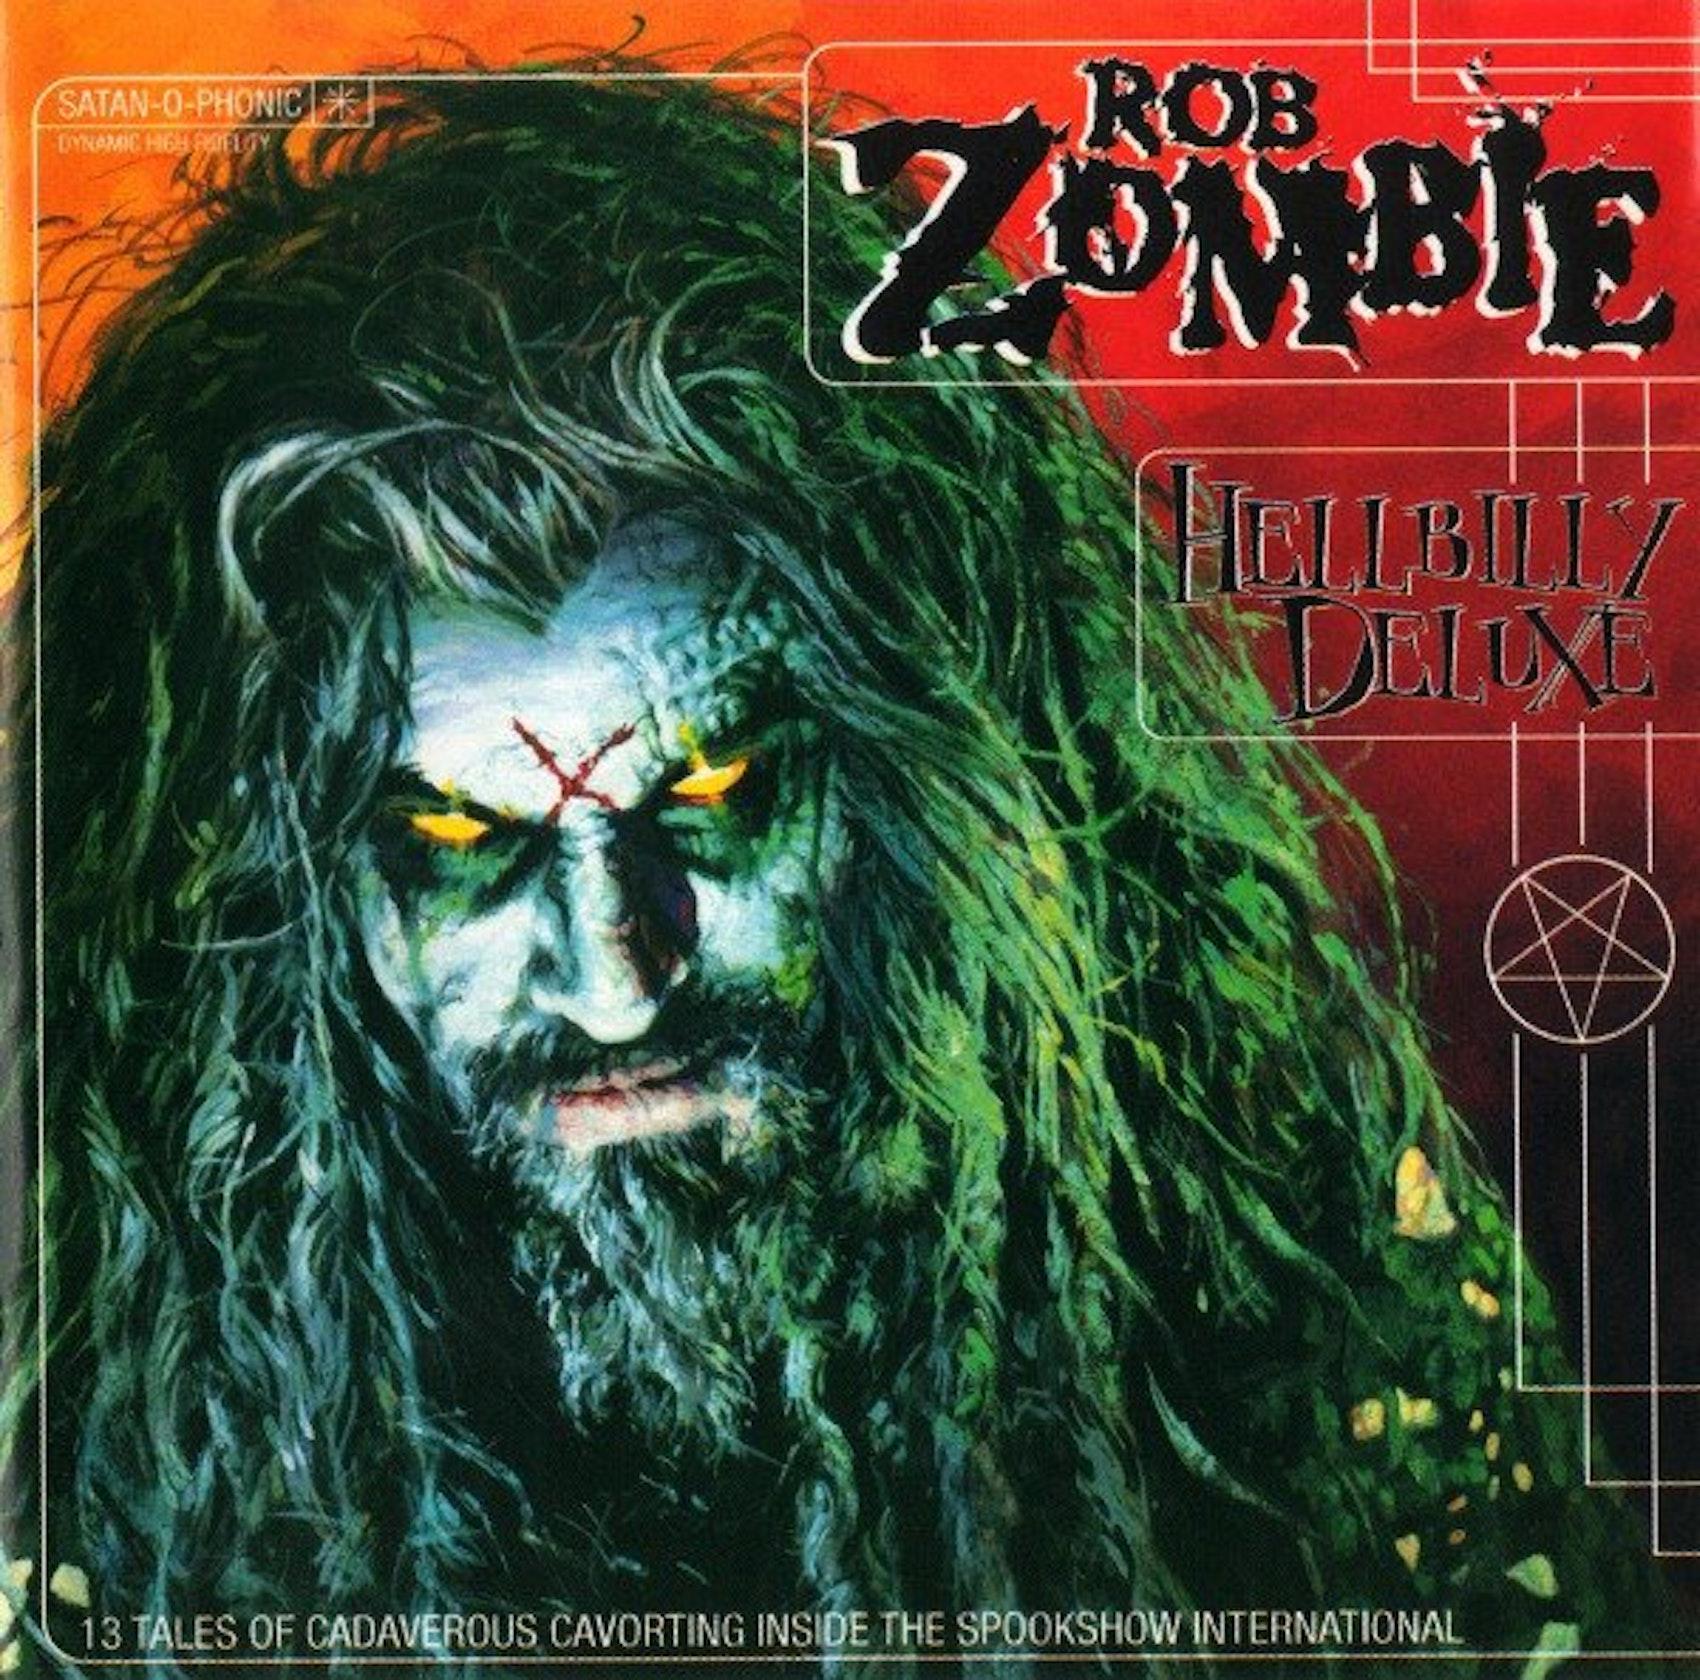 The 10 Best Halloween Albums To Own On Vinyl — Vinyl Me, Please